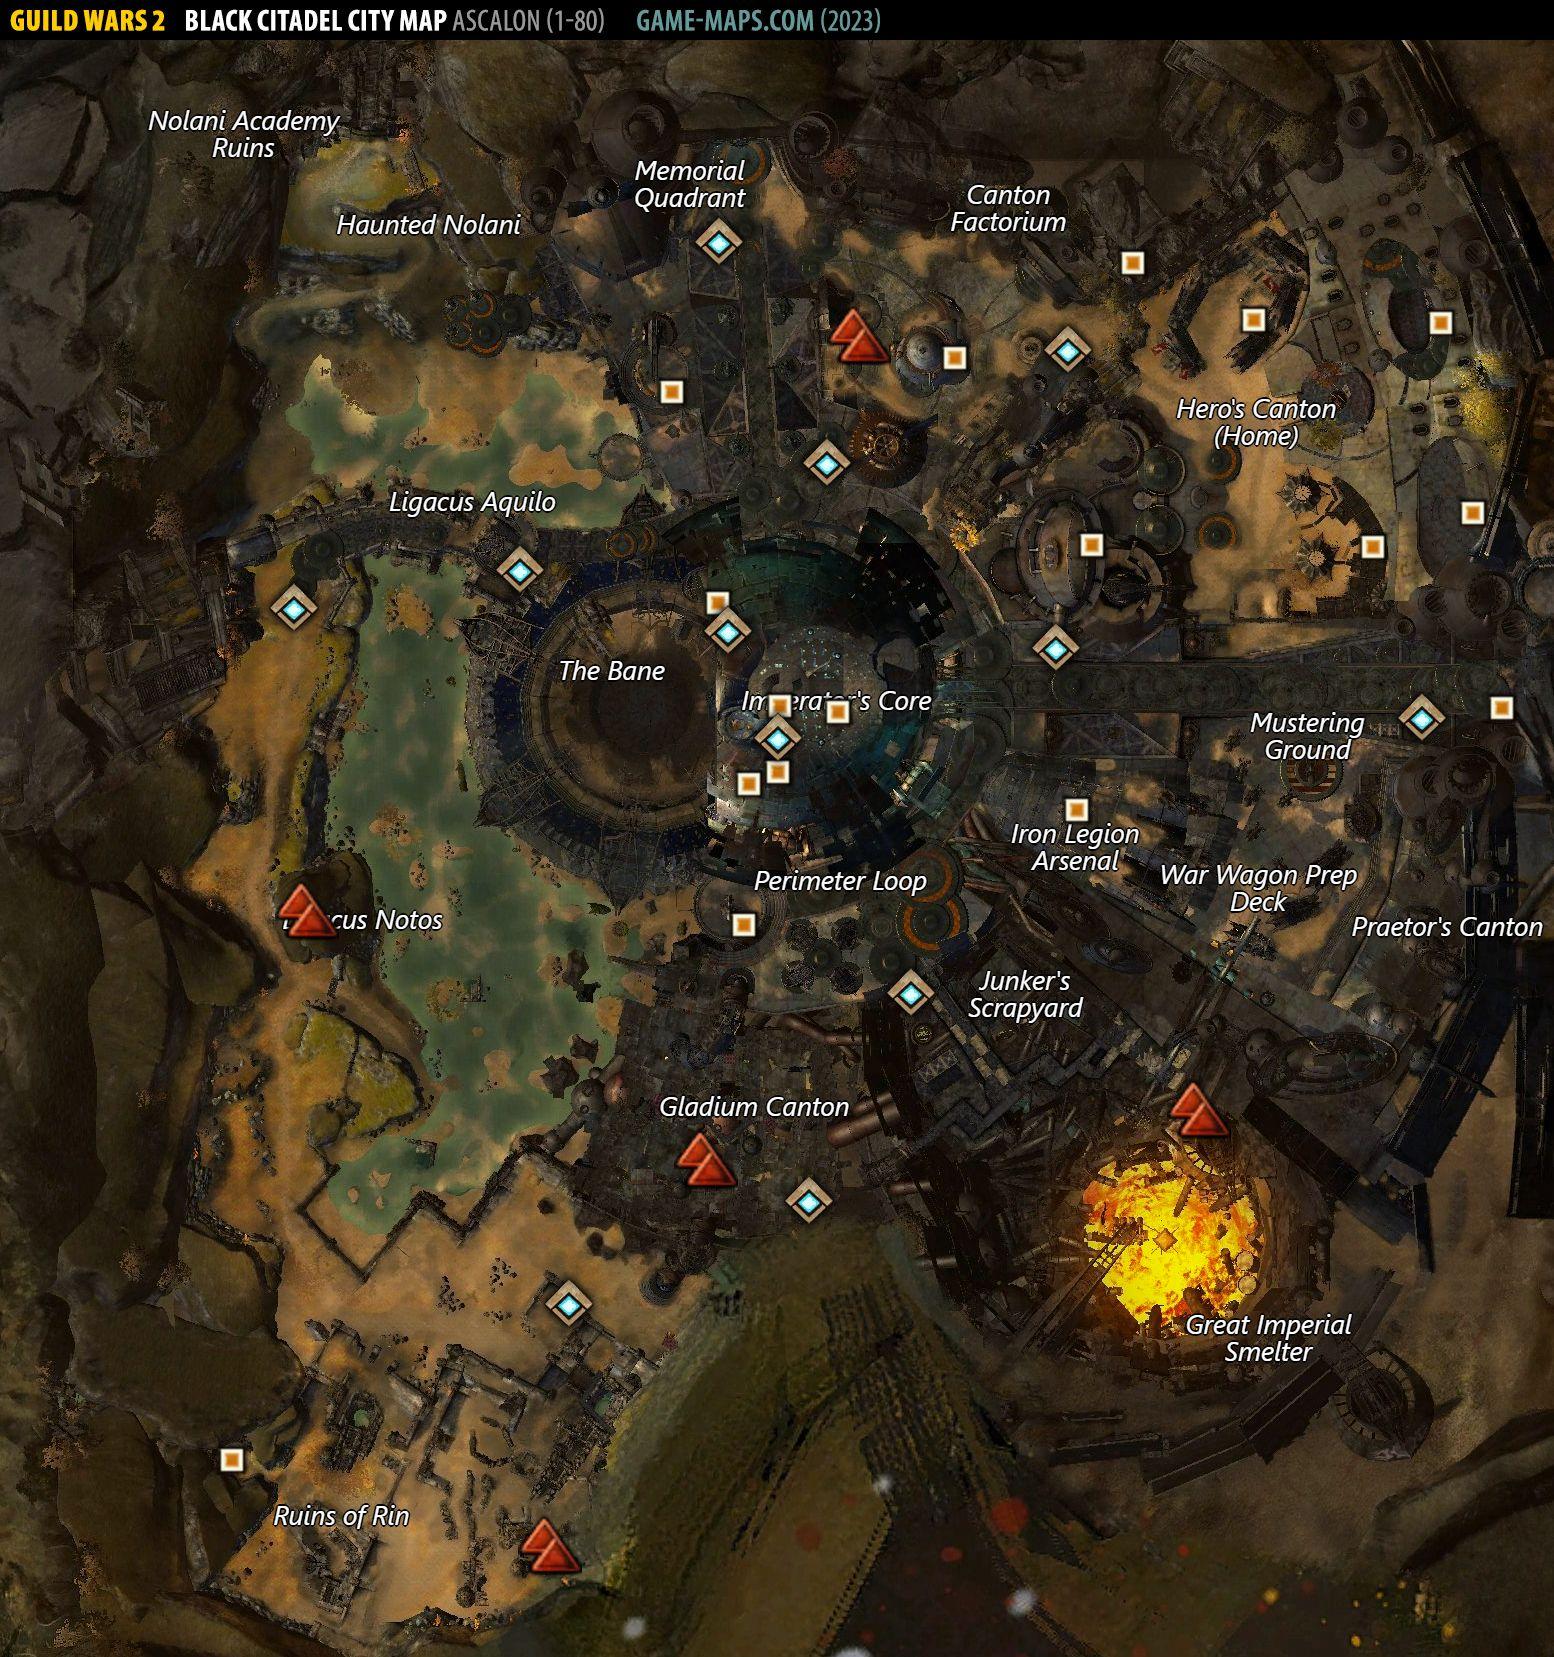 Black Citadel City Map - Guild Wars 2 | game-maps com